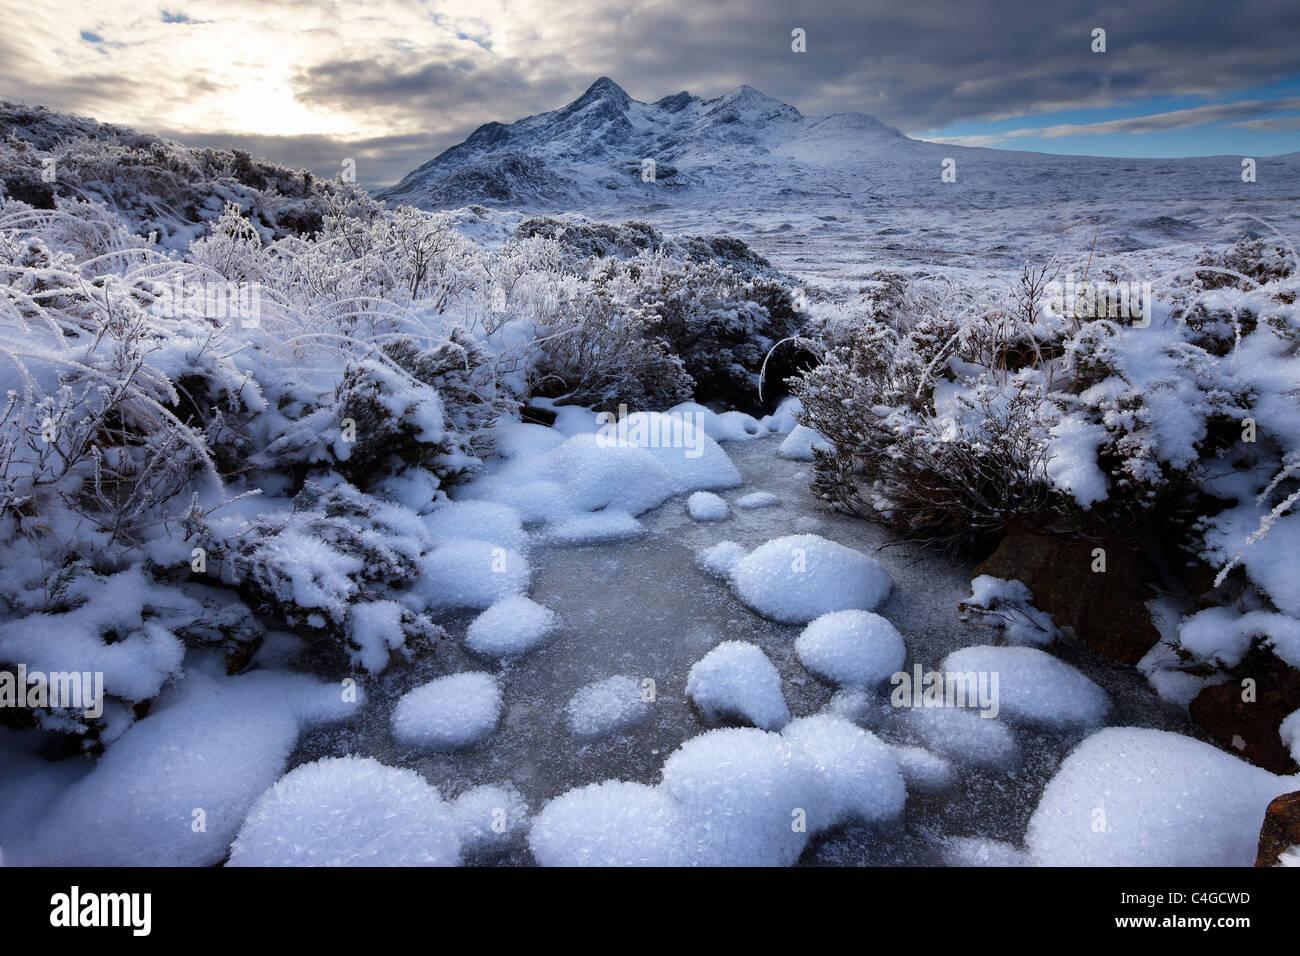 Glen Sligachan & The Cuillin in winter, Isle of Skye, Scotland - Stock Image